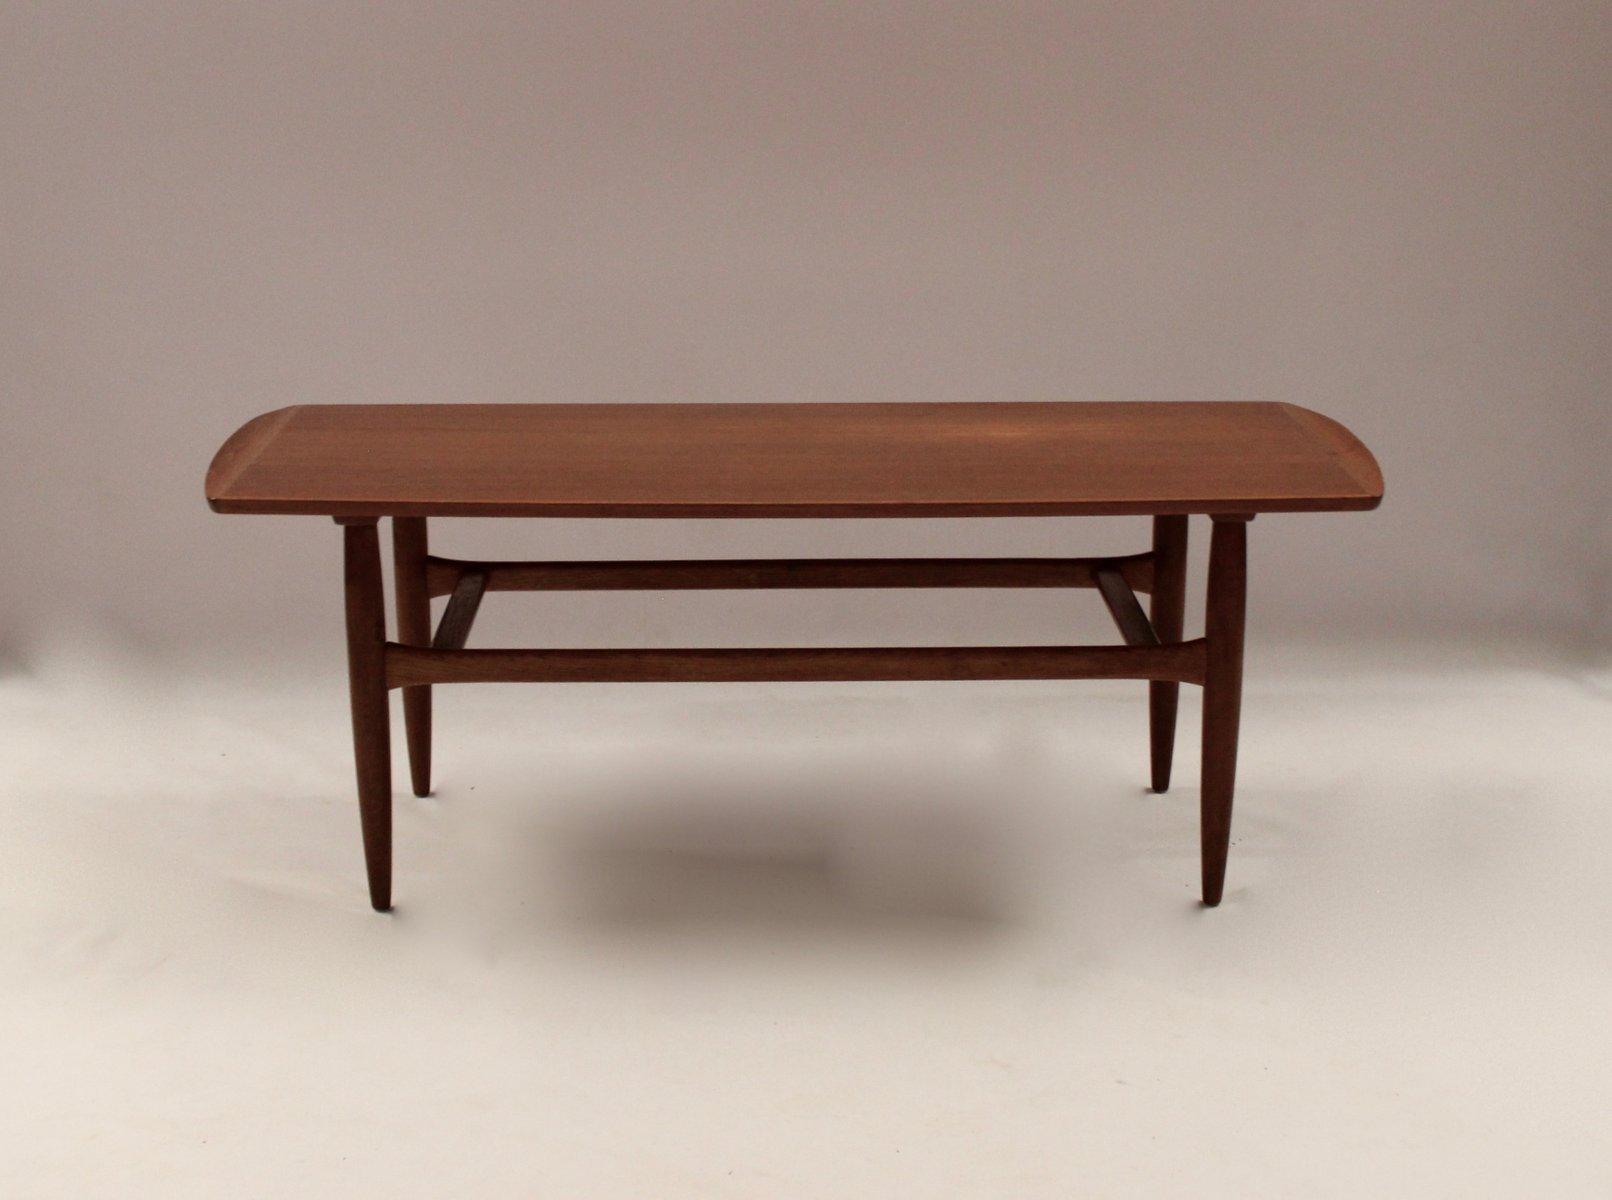 Danish Teak Coffee Table From Jason 1960s